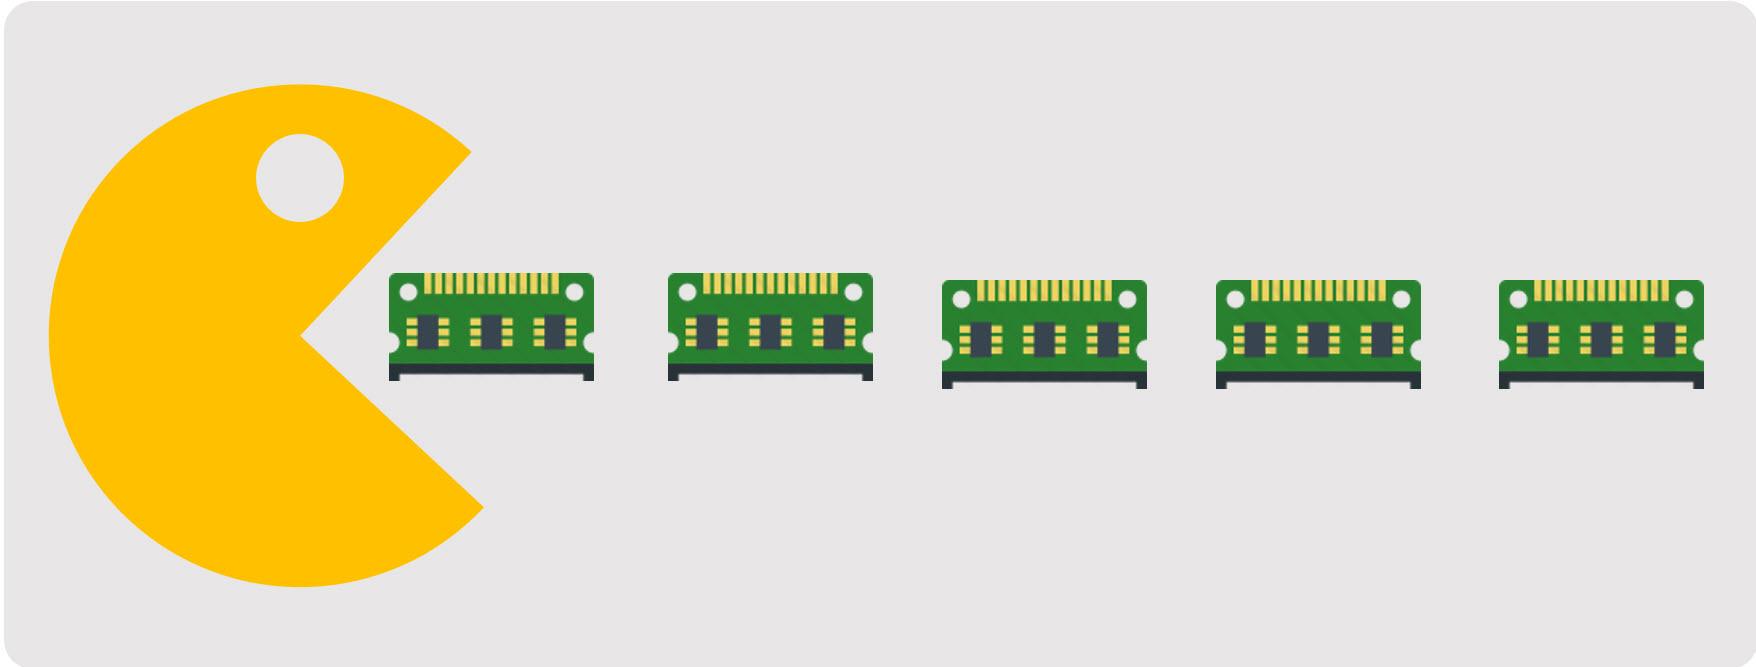 Memory Leaks in NodeJS | Quick Overview - tajawal - Medium